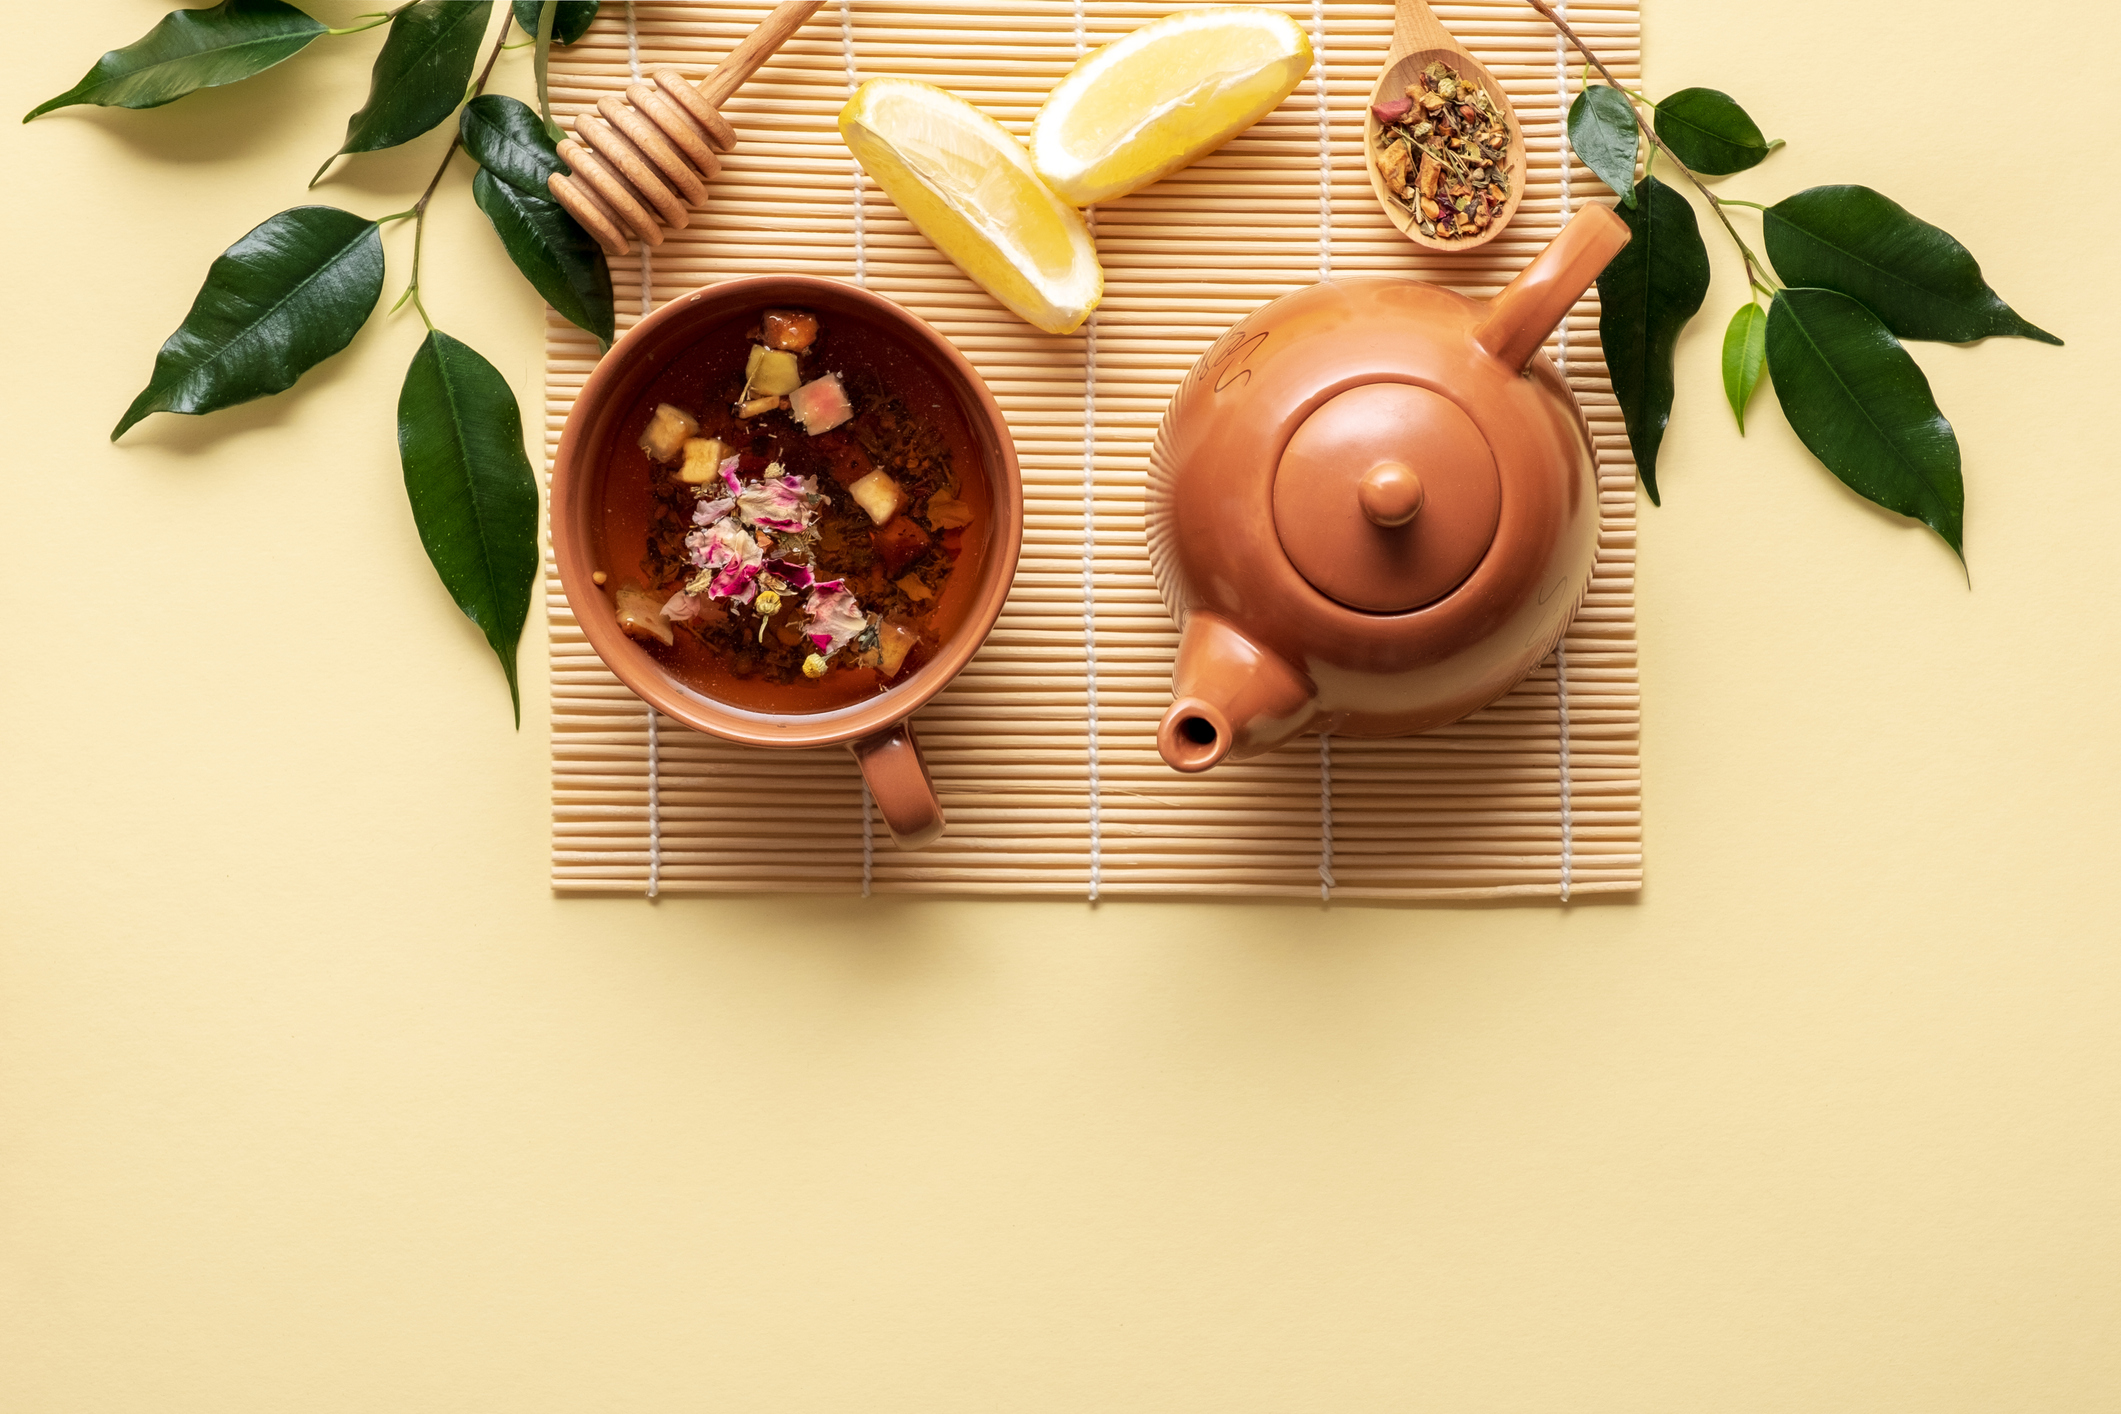 stock photo of prepared tea and a teapot